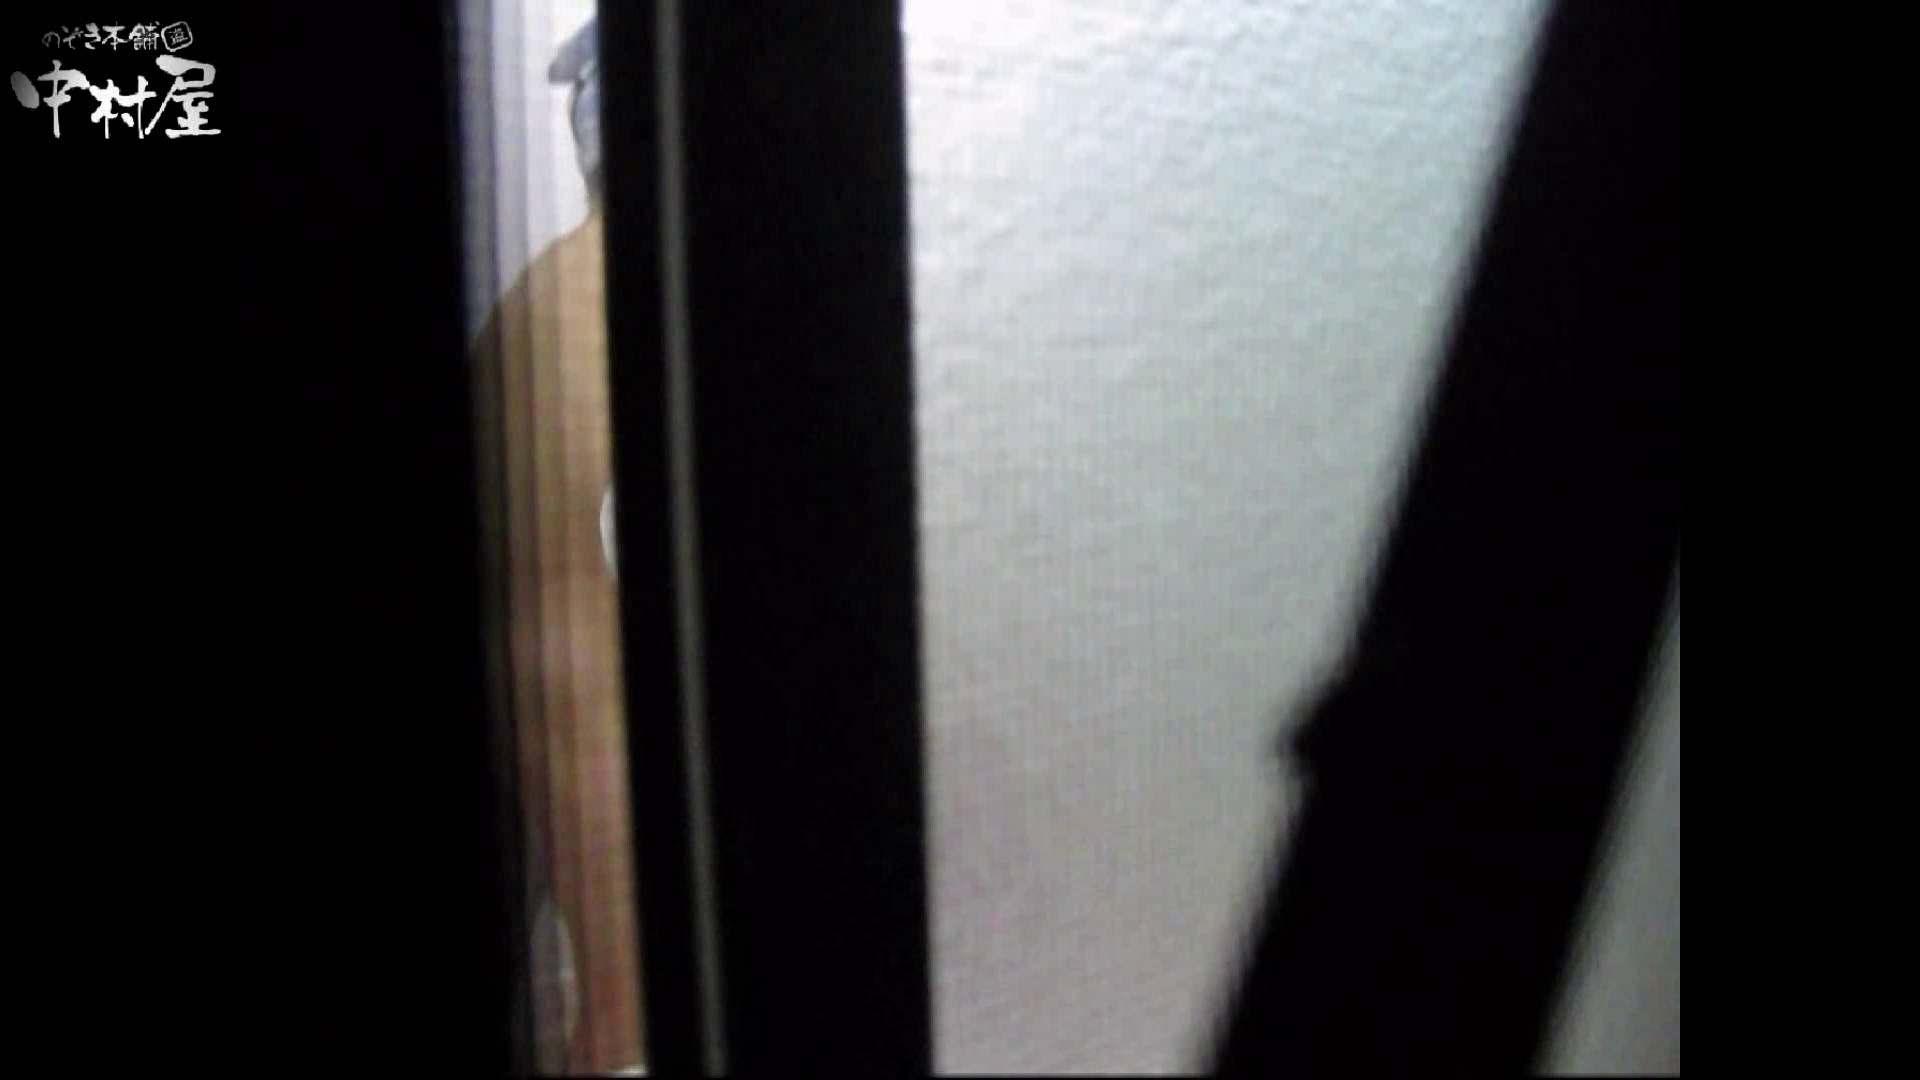 民家風呂専門盗撮師の超危険映像 vol.002 リアル股間  109Pix 68